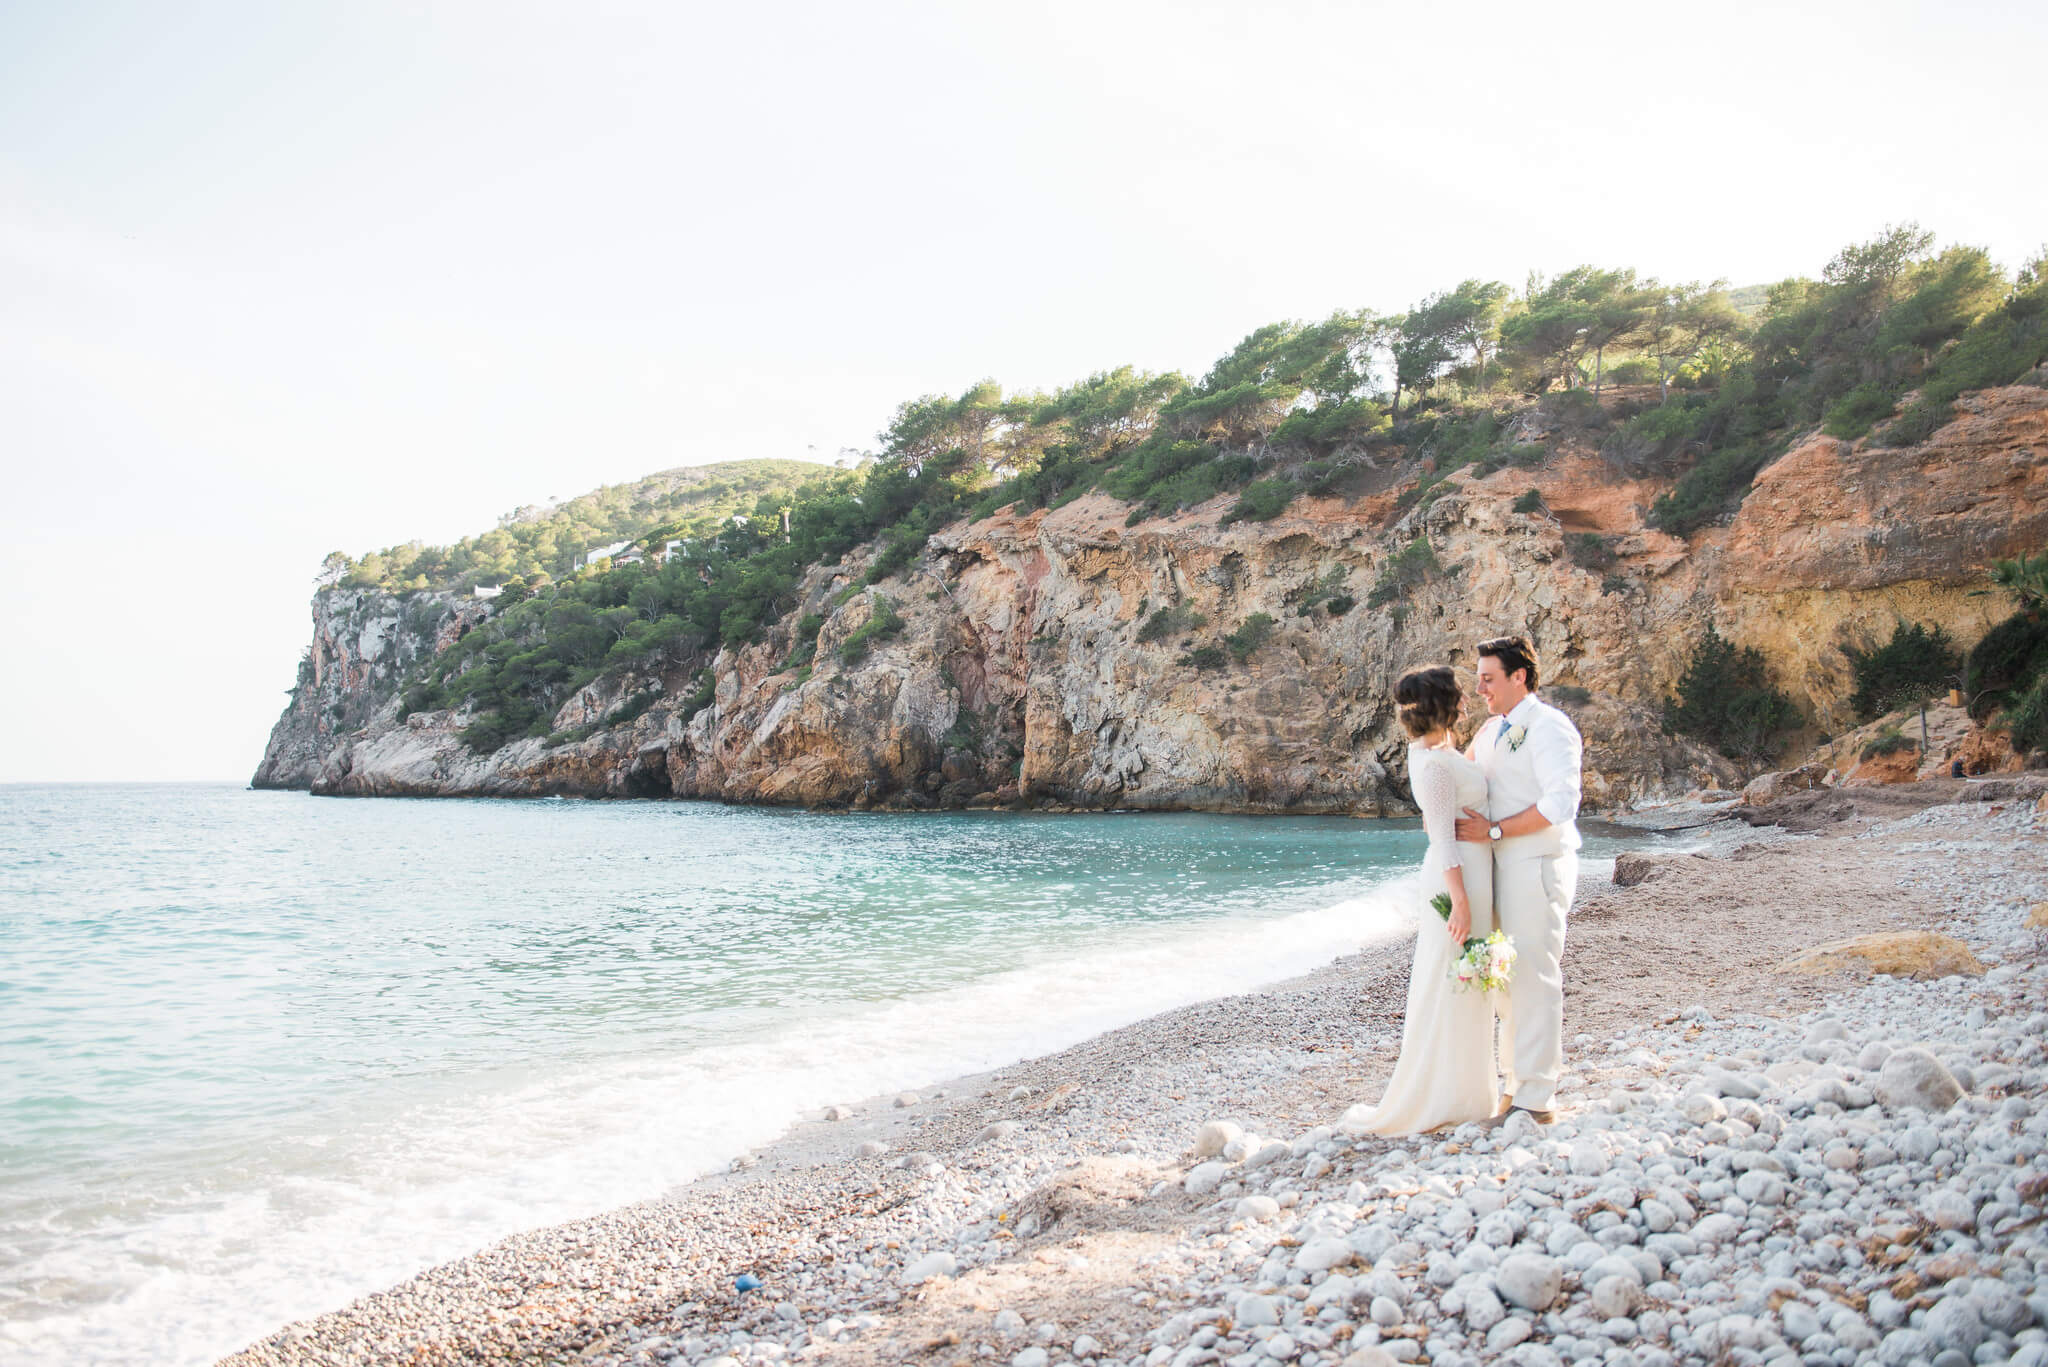 https://www.white-ibiza.com/wp-content/uploads/2020/03/ibiza-wedding-venues-amante-ibiza-2020-01.jpg